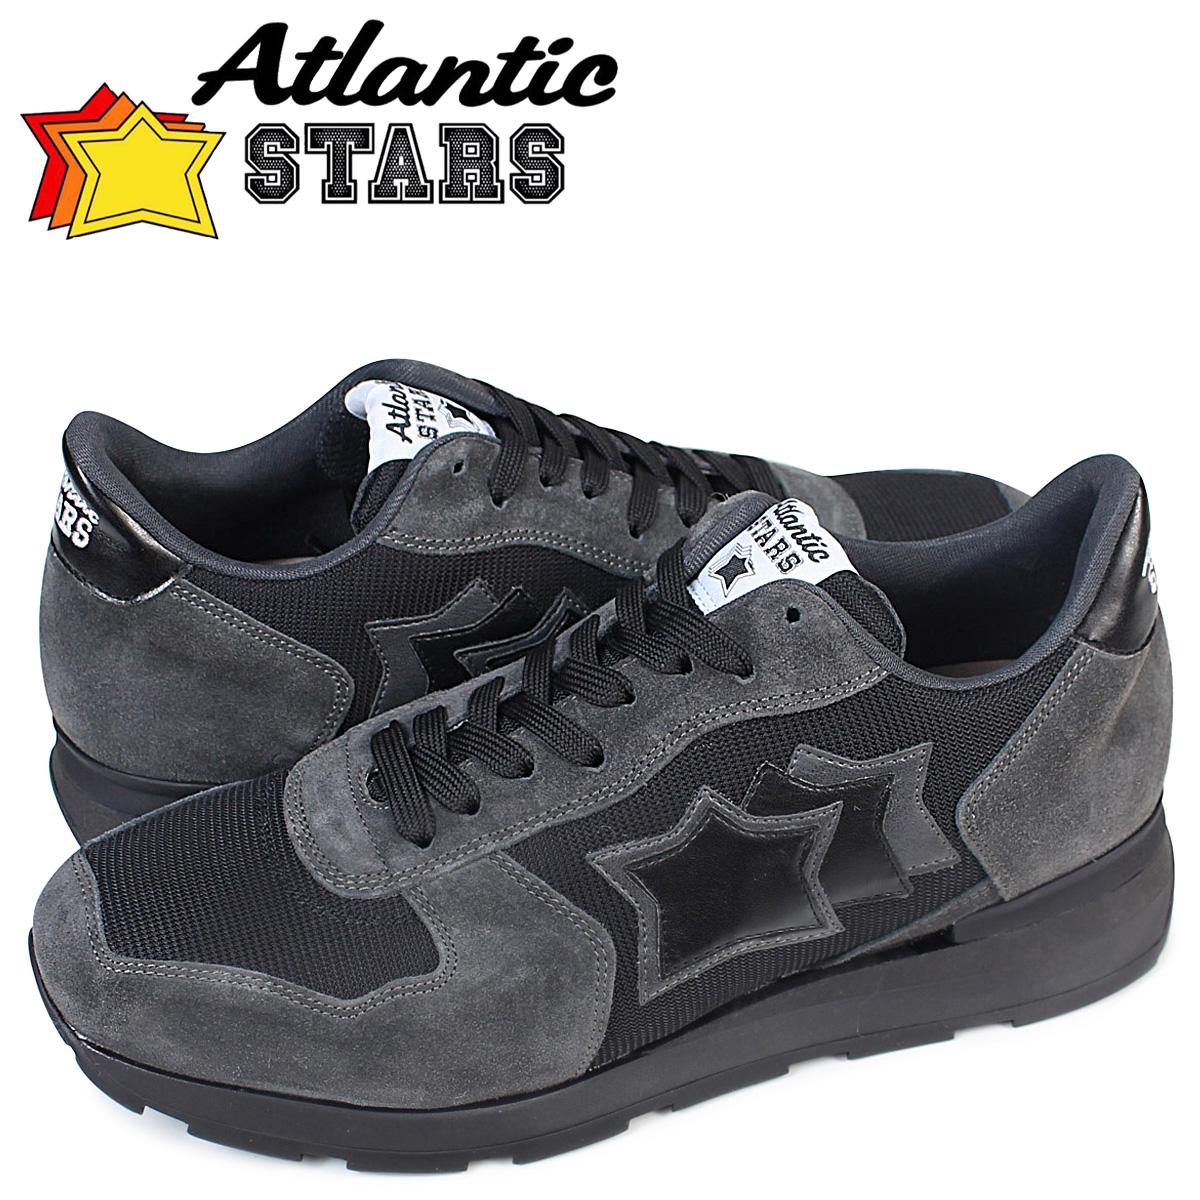 Atlantic STARS メンズ スニーカー アトランティックスターズ アンタレス ANTARES ANA 72N 靴 ダークグレー 【決算セール 返品不可】